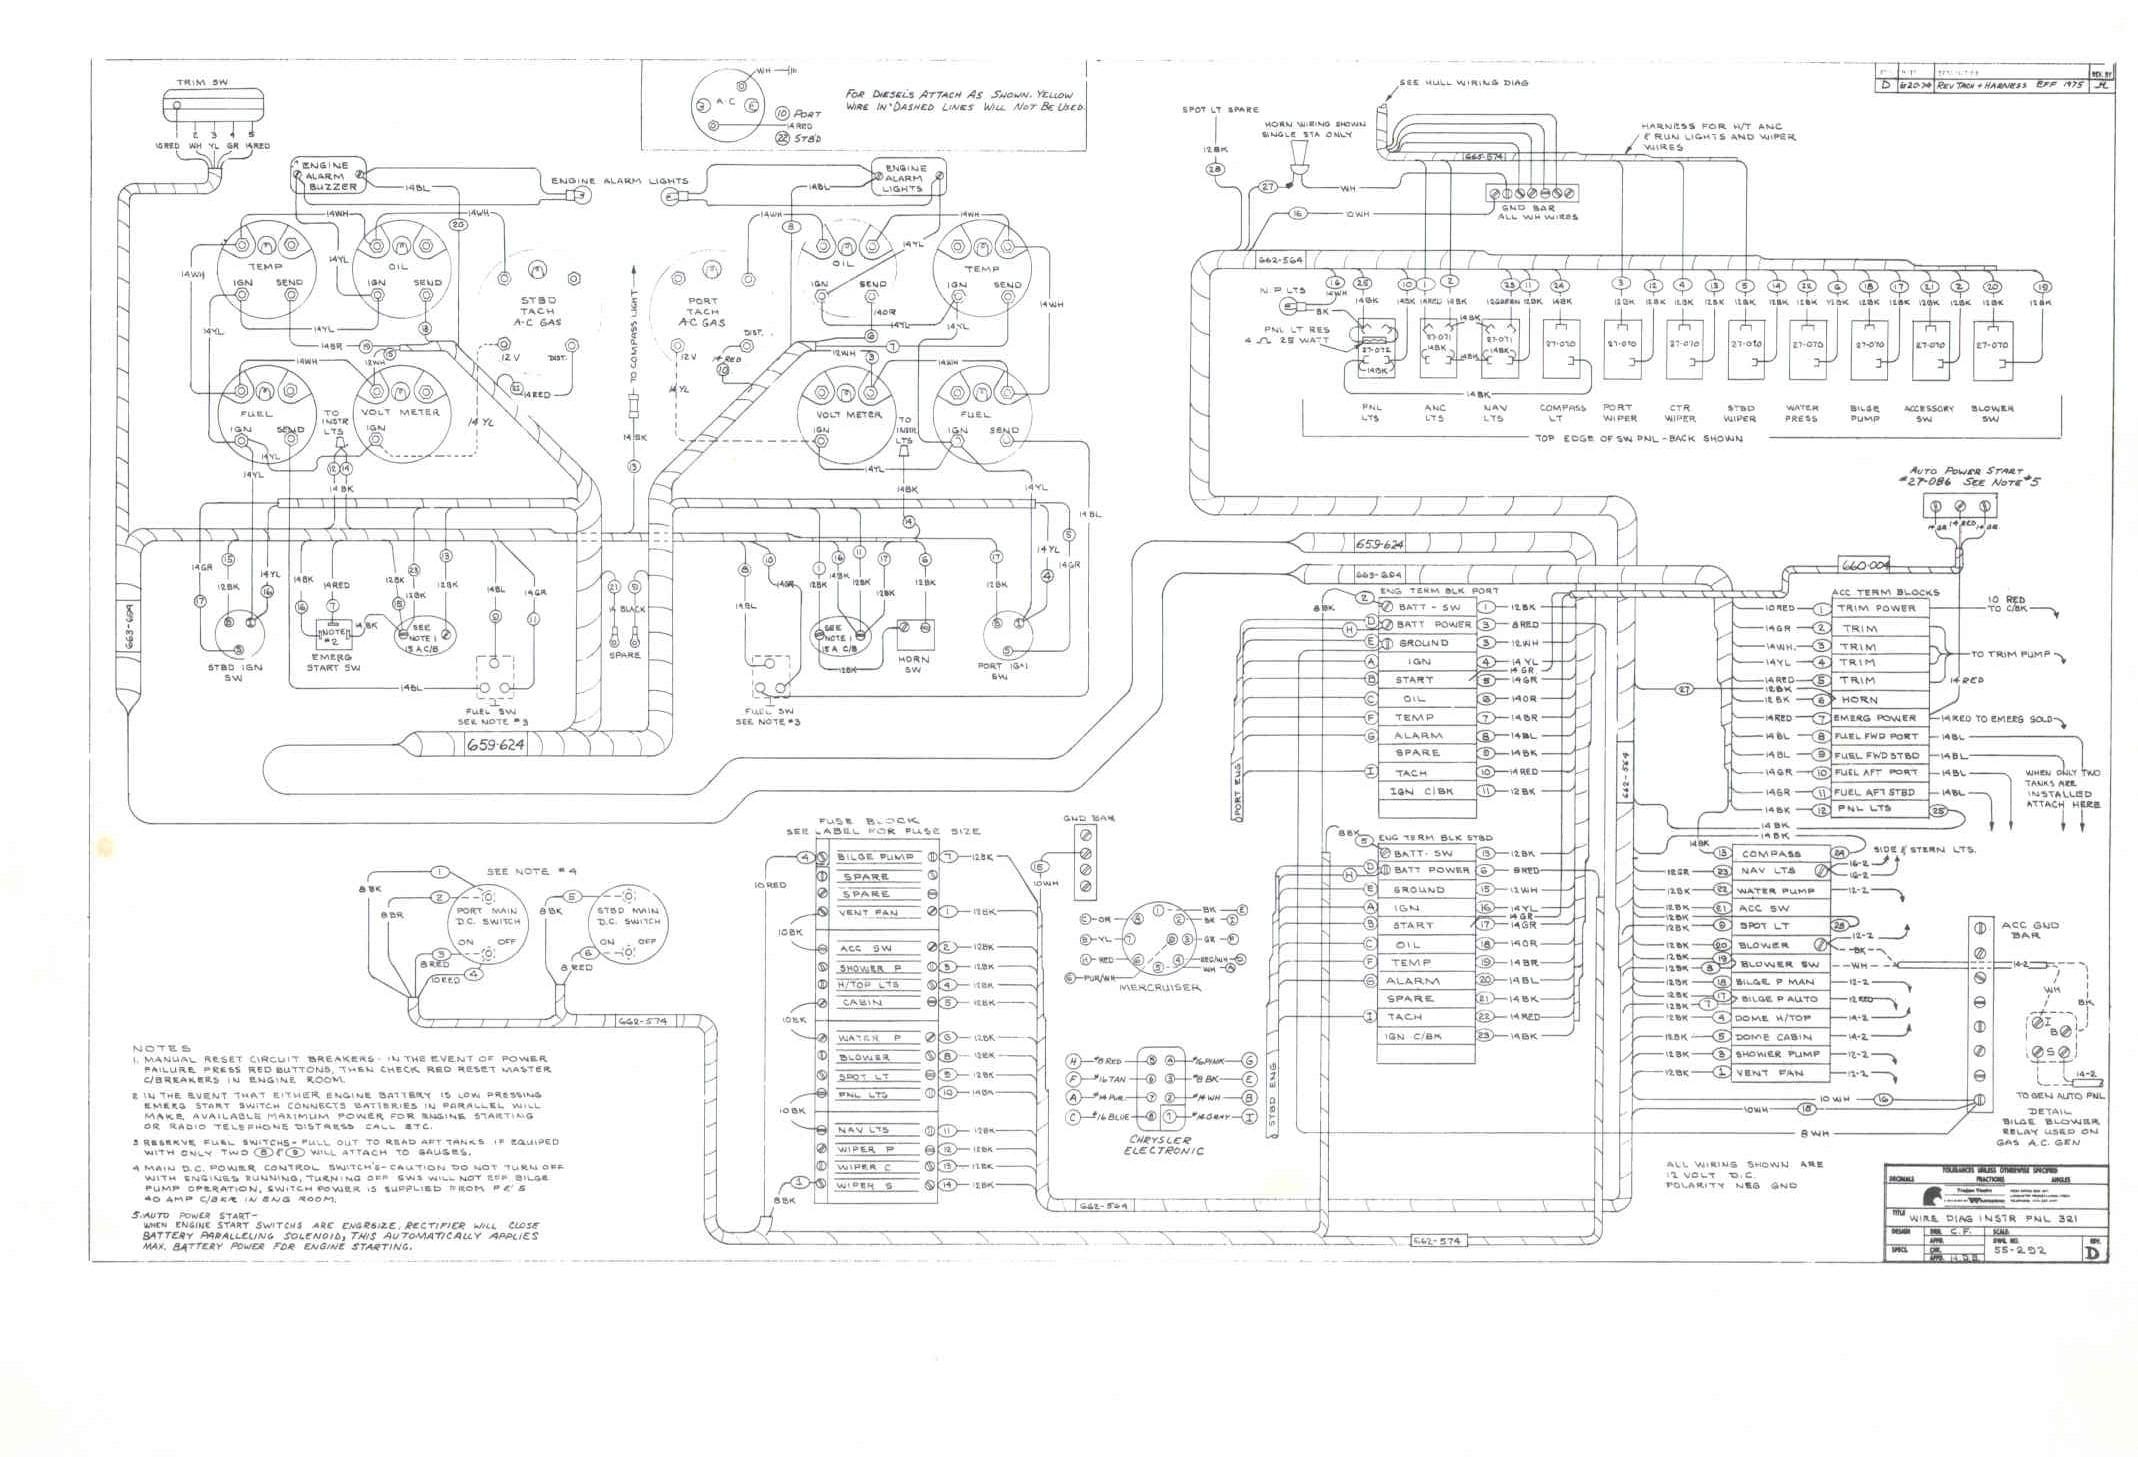 F32 Wiring Problems